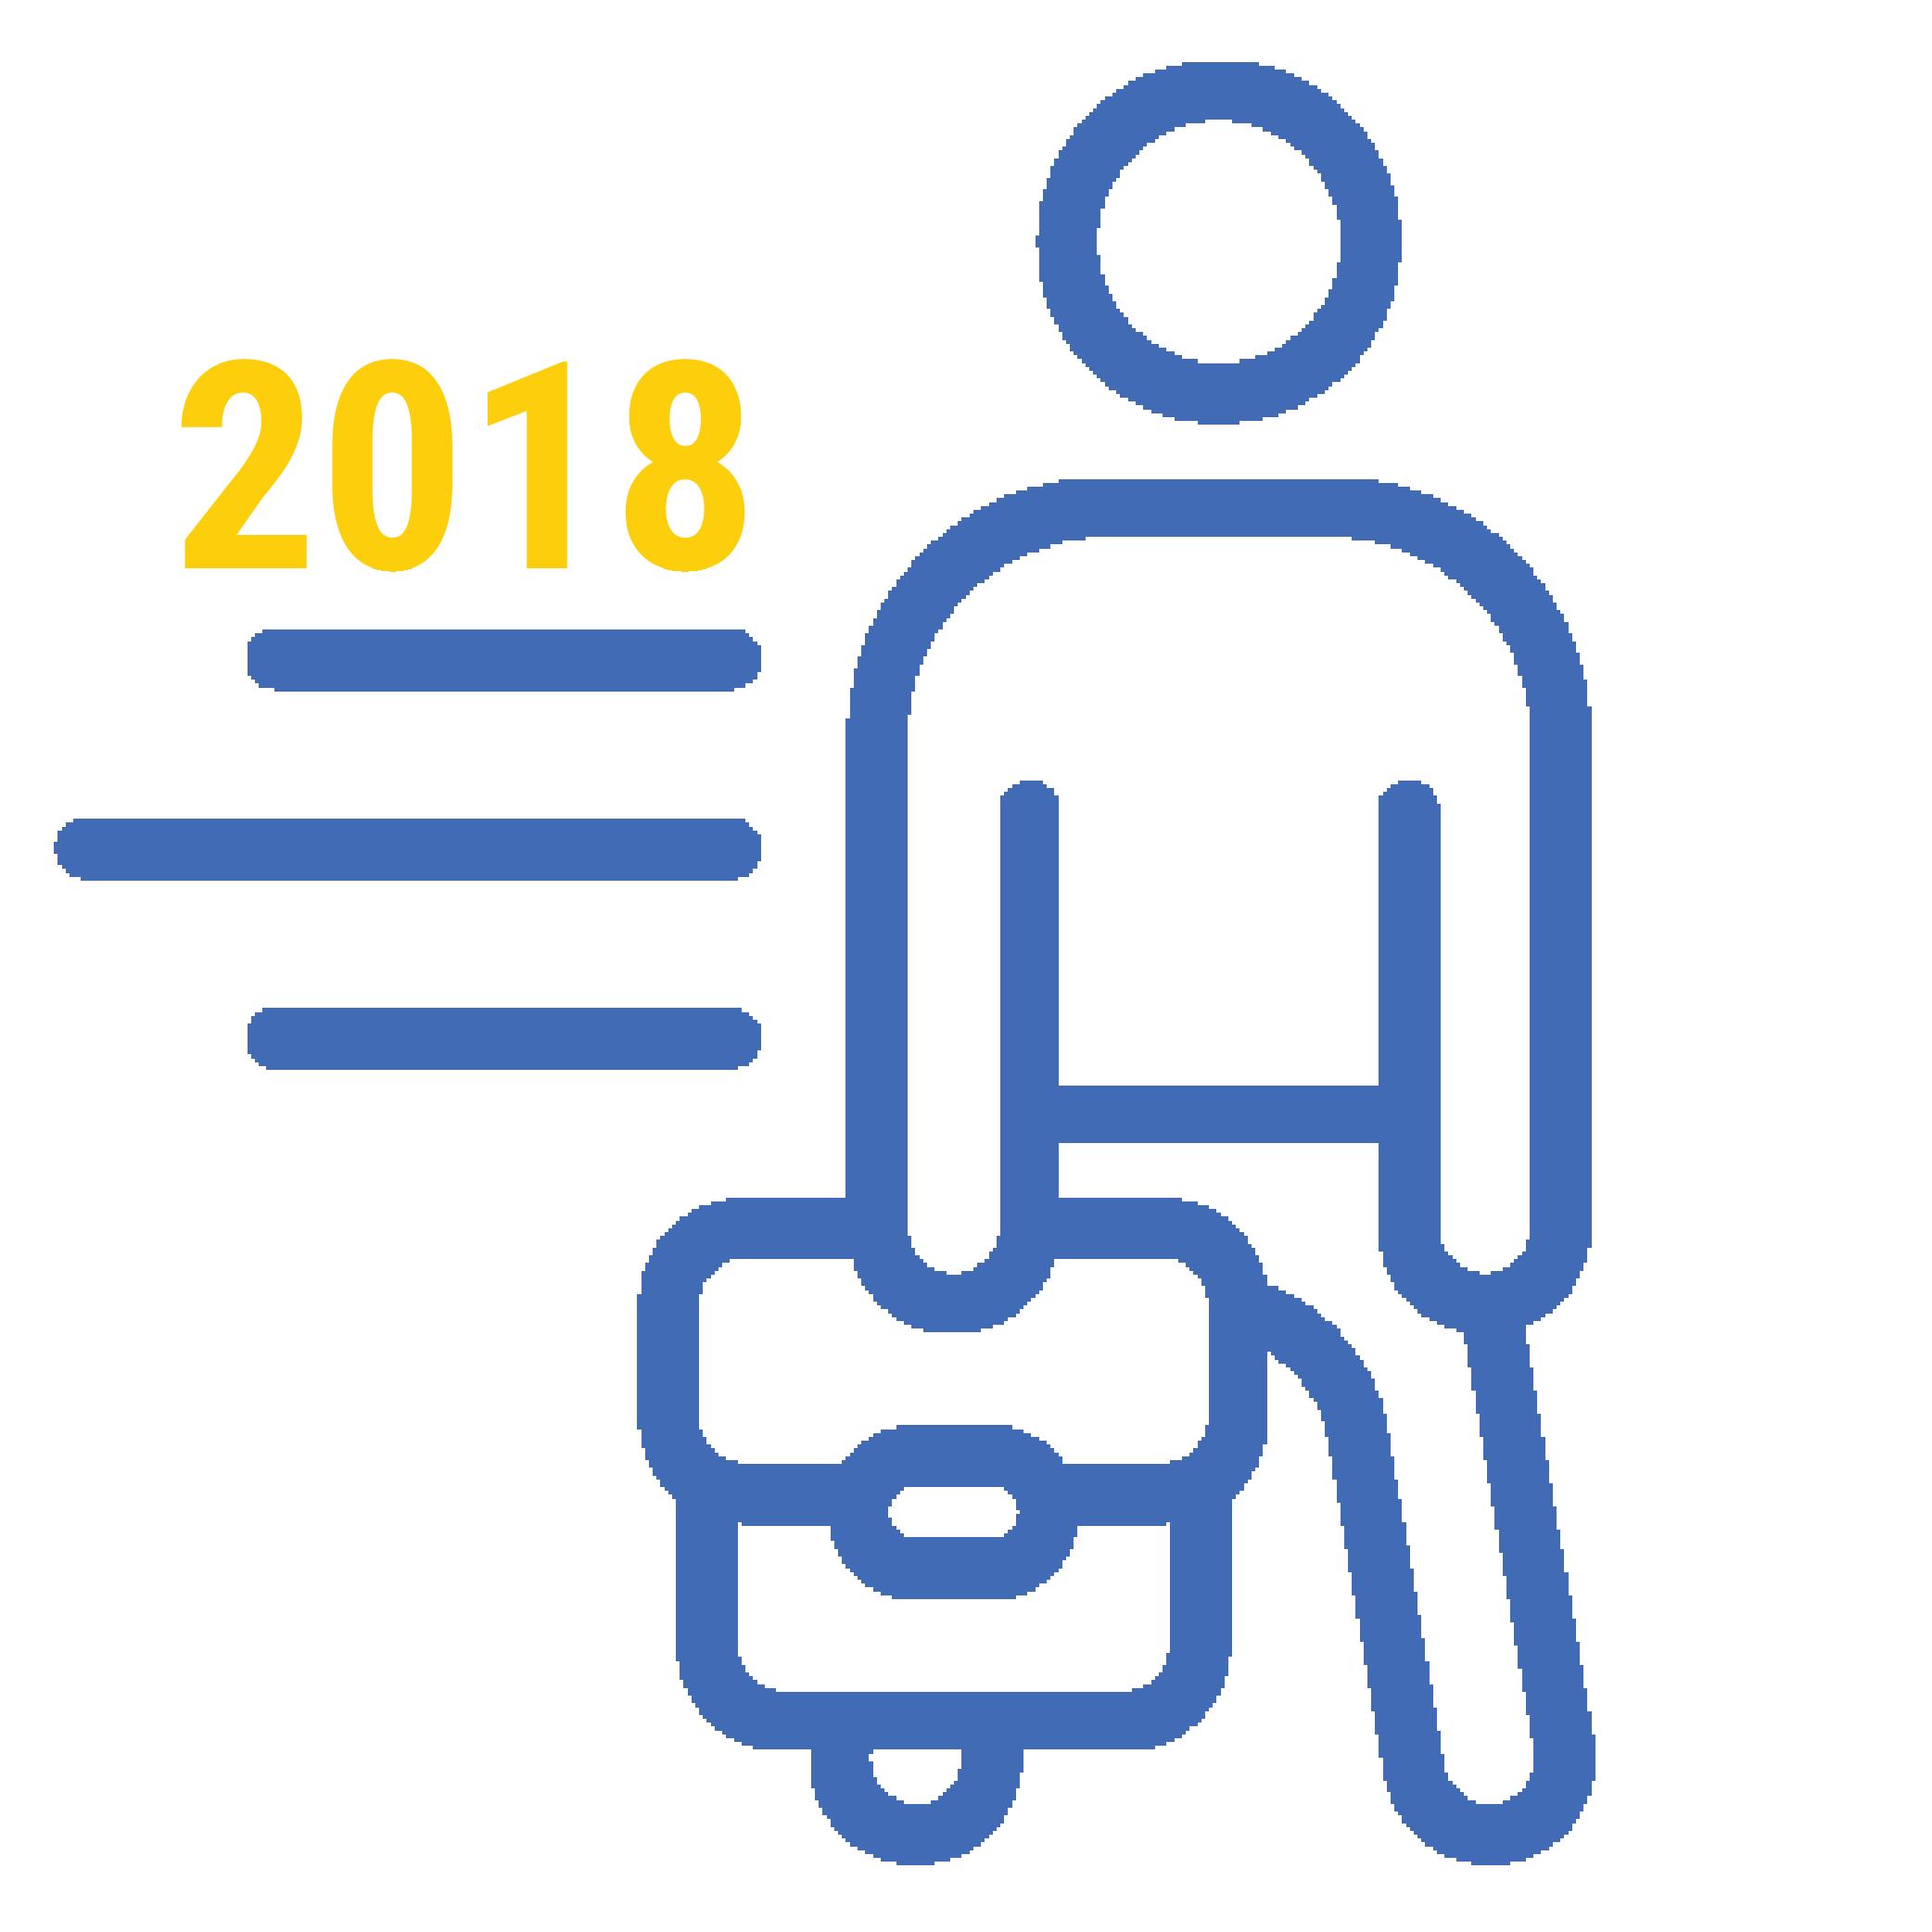 Plano Anual de Atividades 2018